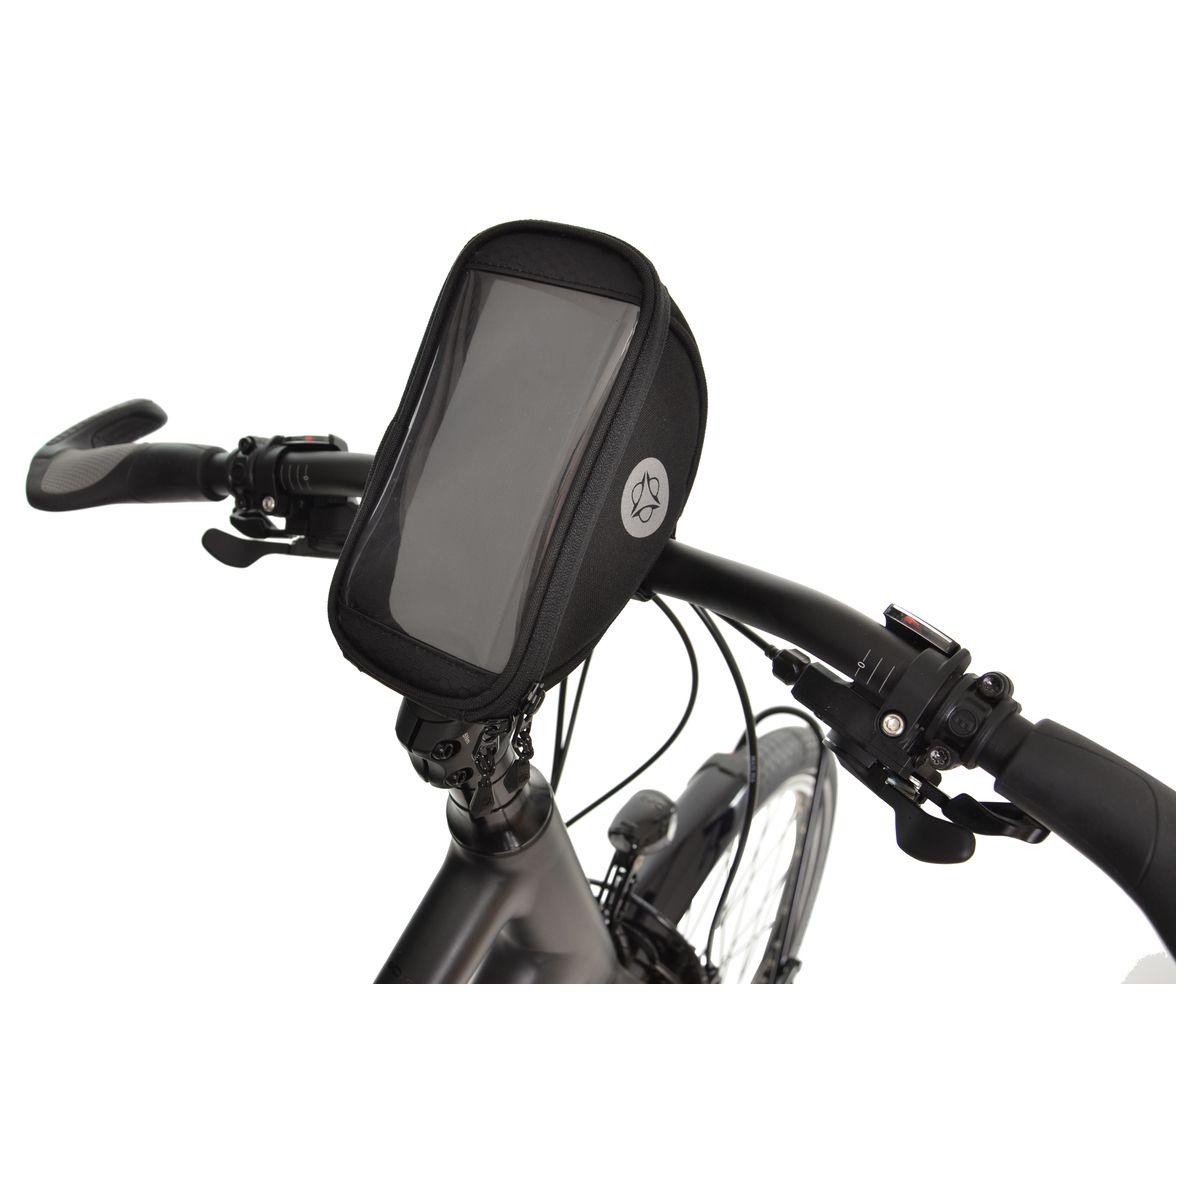 Phone Holder Frame Bag Performance DWR fit example